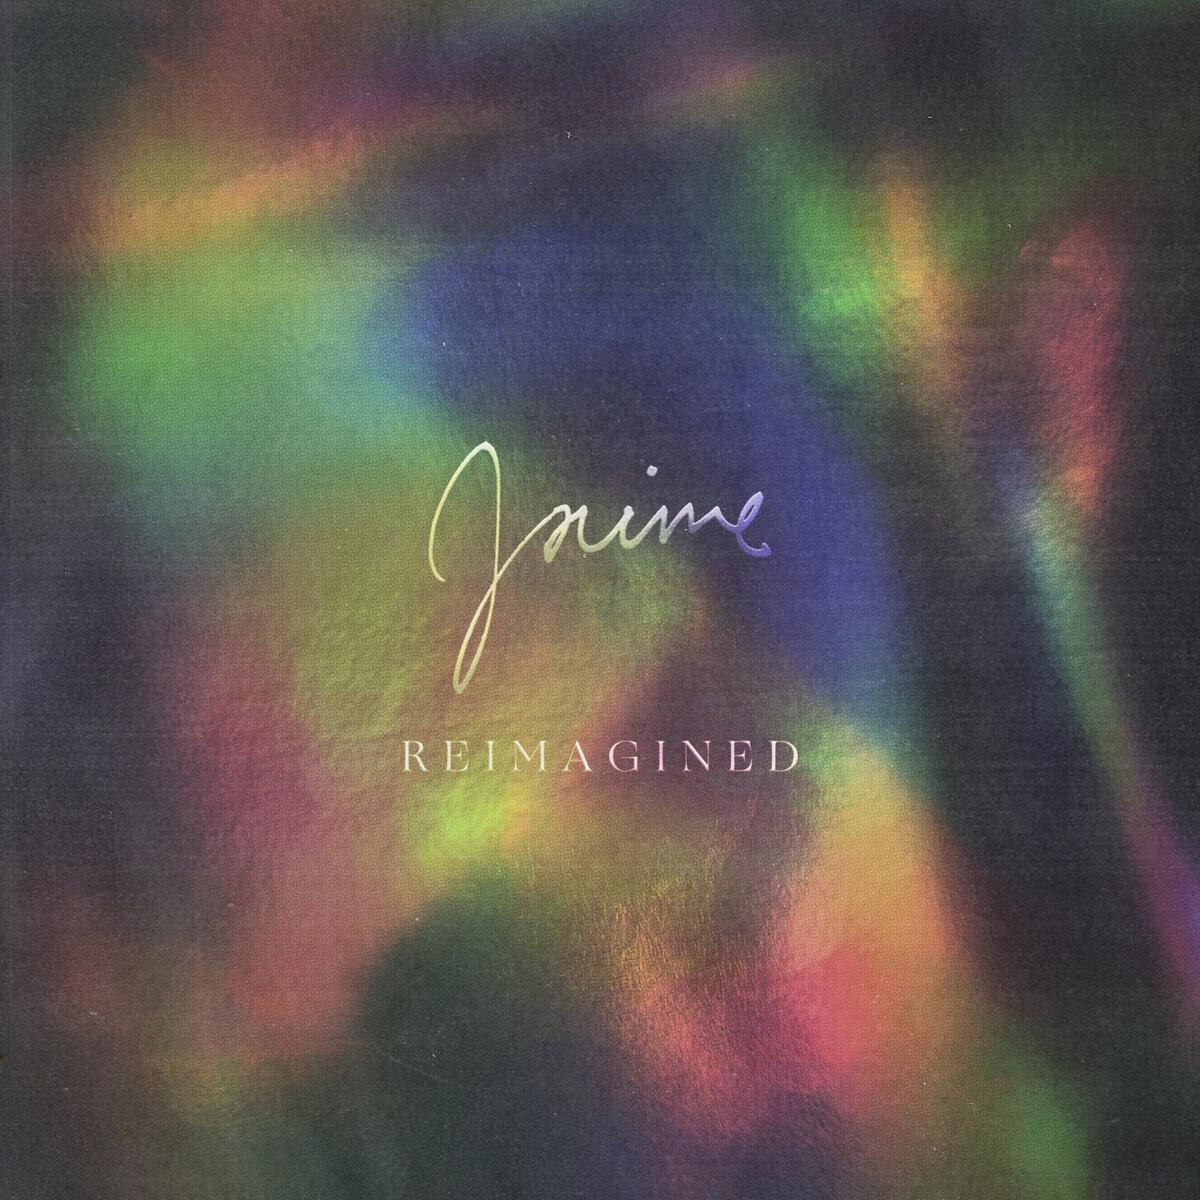 Brittany Howard / Jaime Reimagined